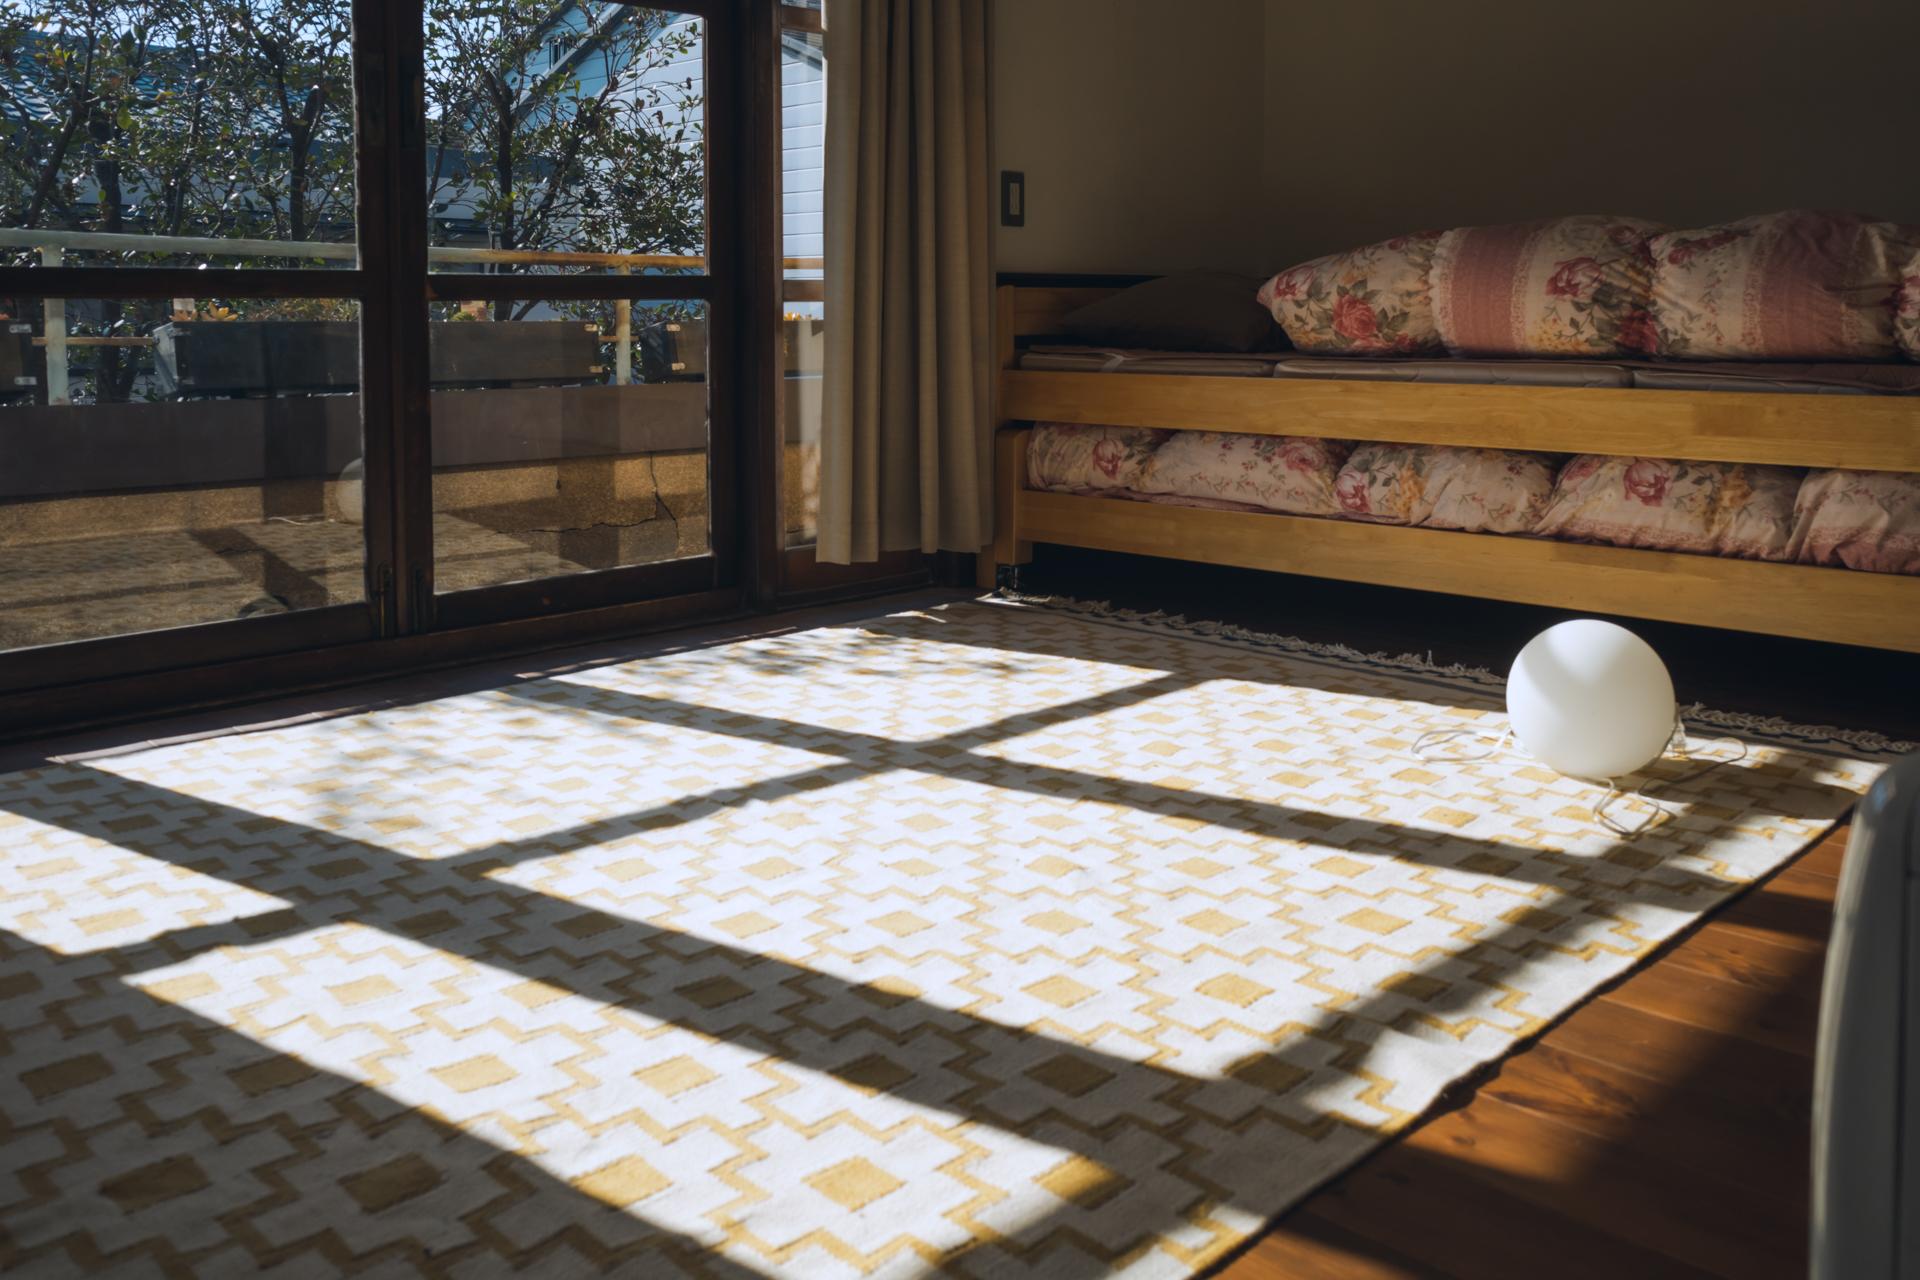 「GR III 京都」日暮荘 Higurashi-Sou 日記